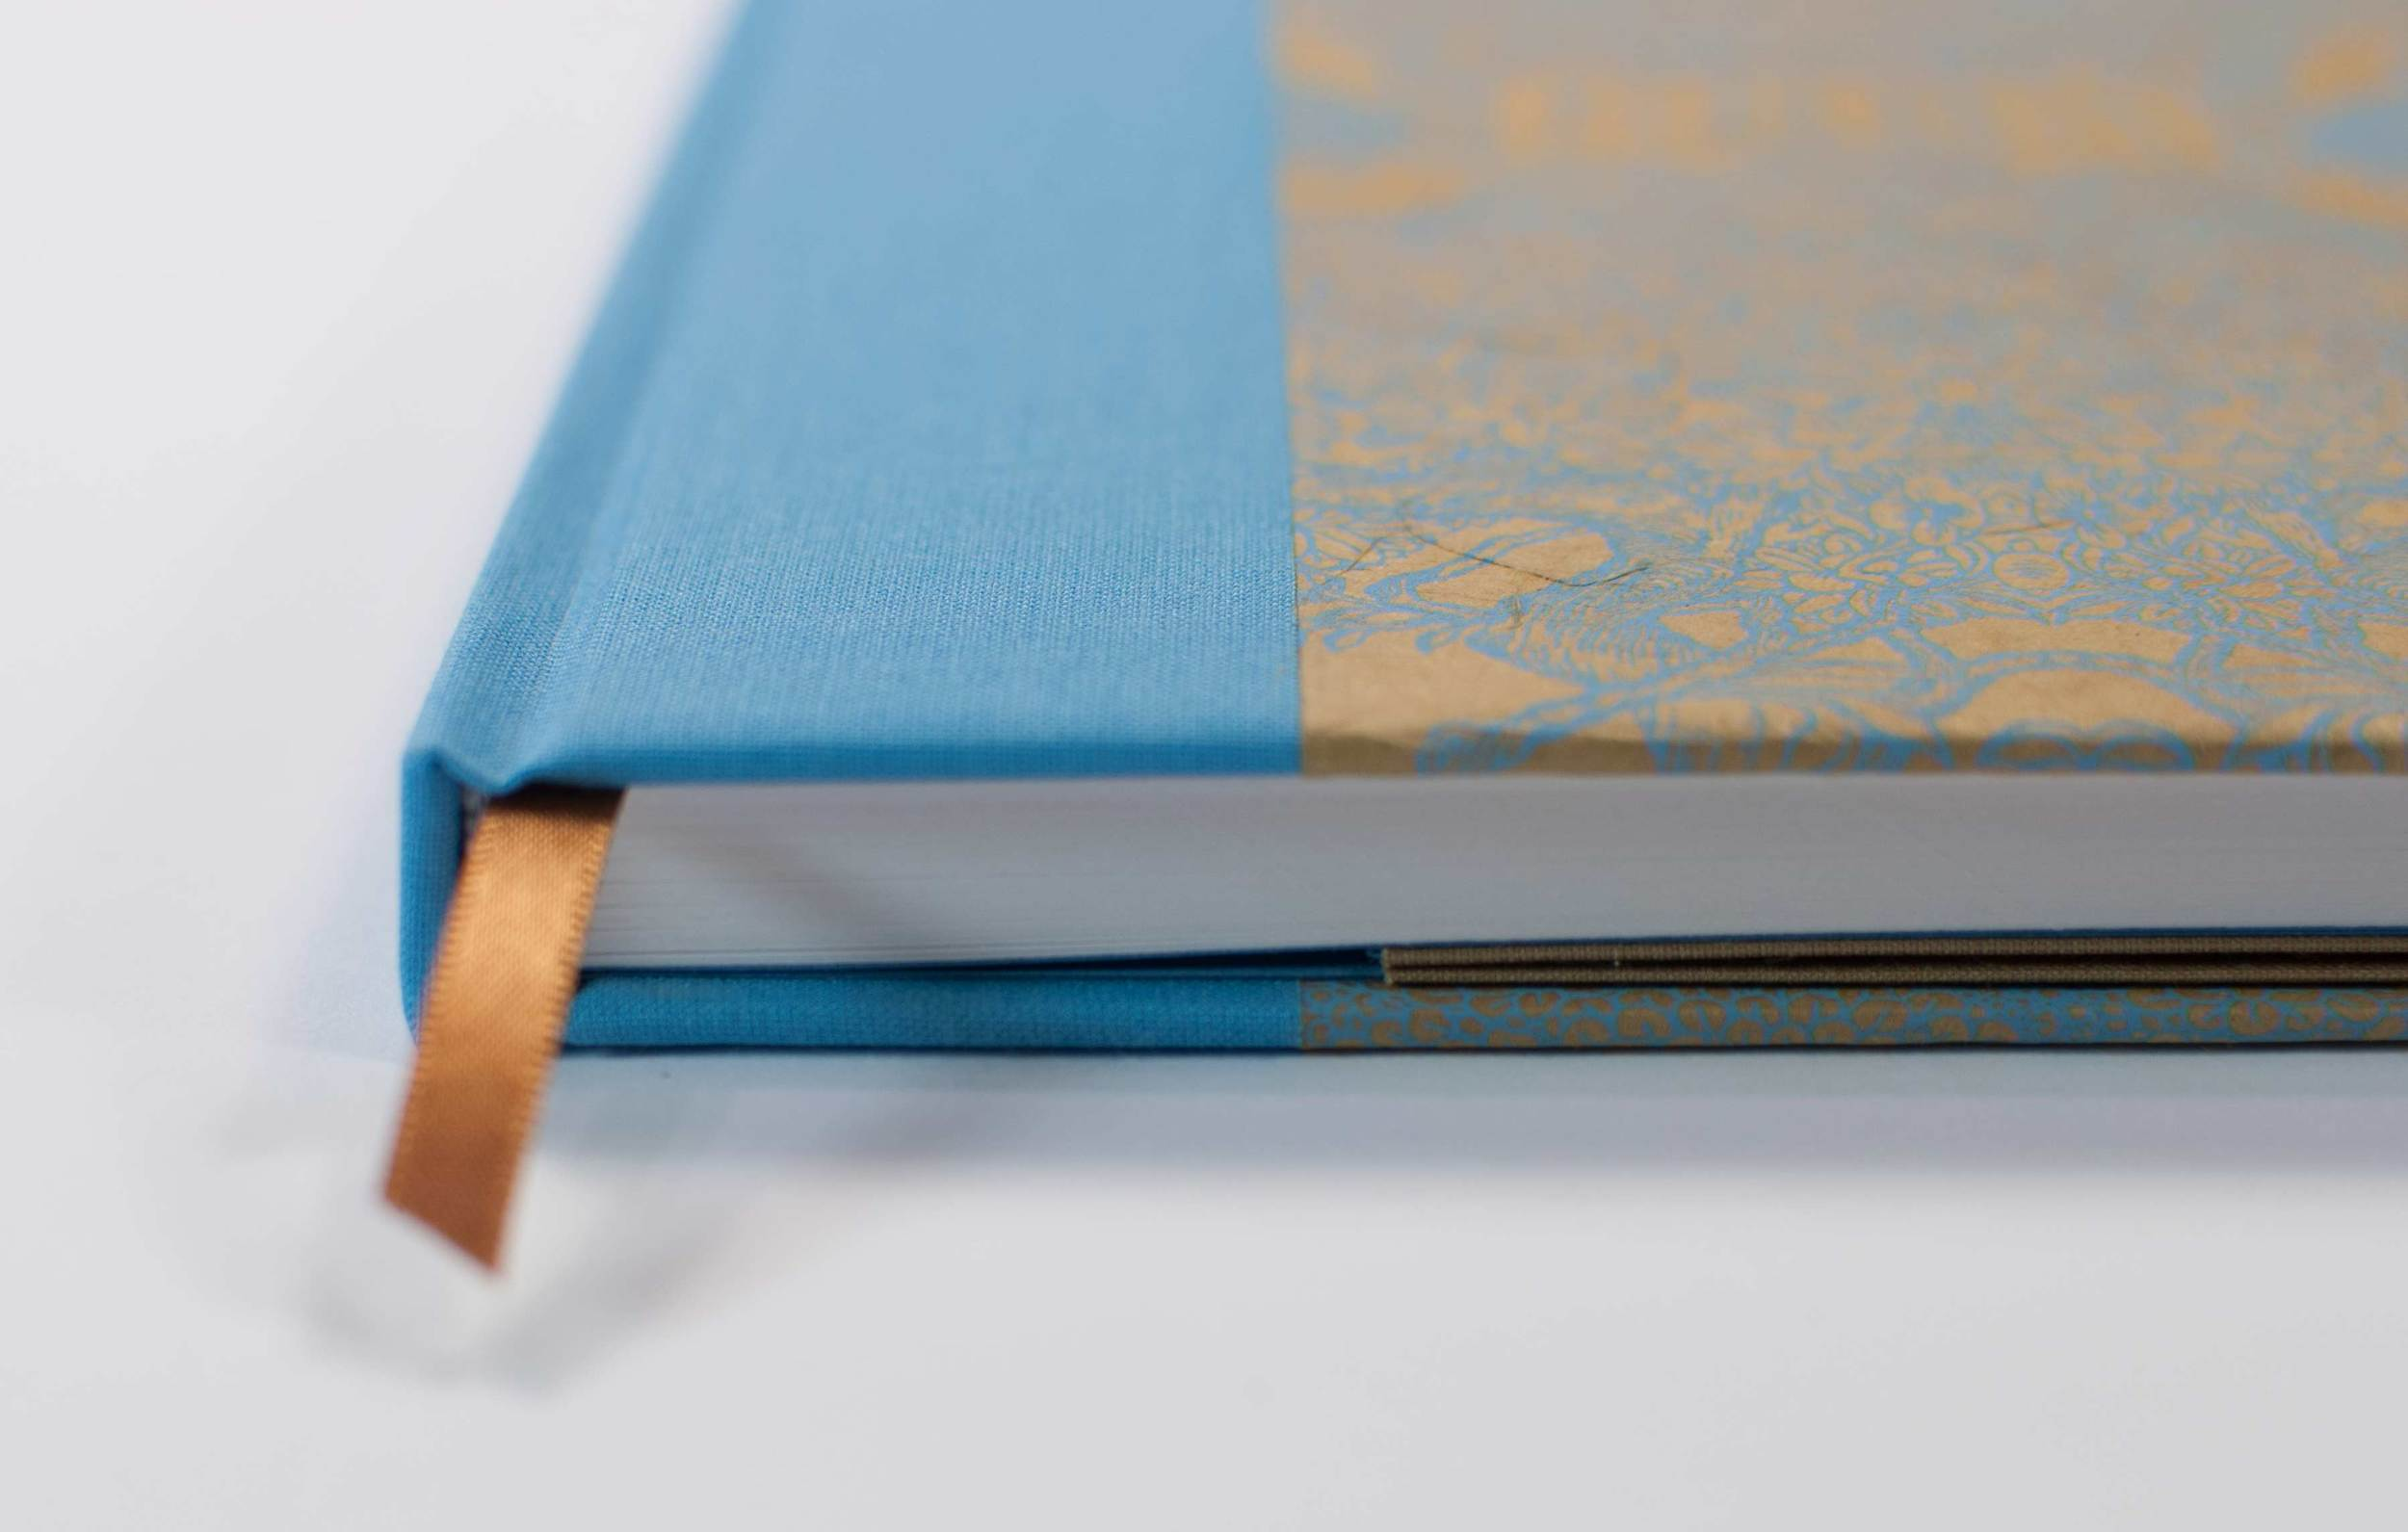 Evie Miller's Notebook